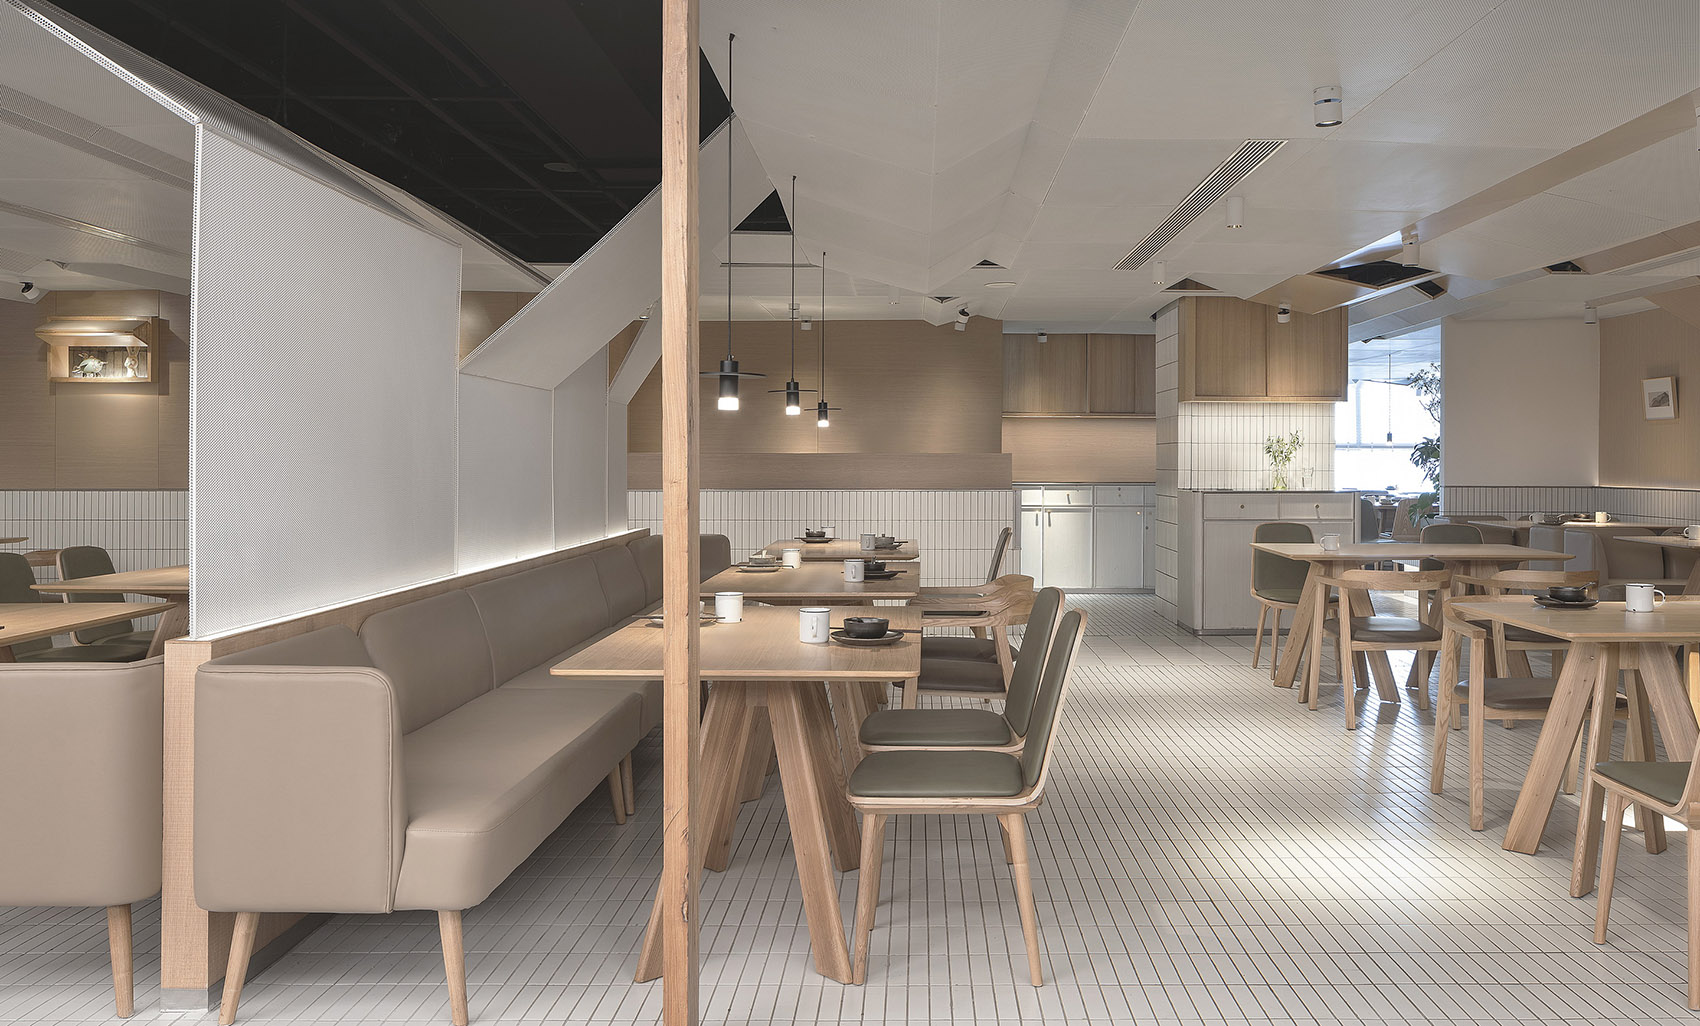 009-goose-hut-home-bistro-china-by-golucci-interior-architects.jpg